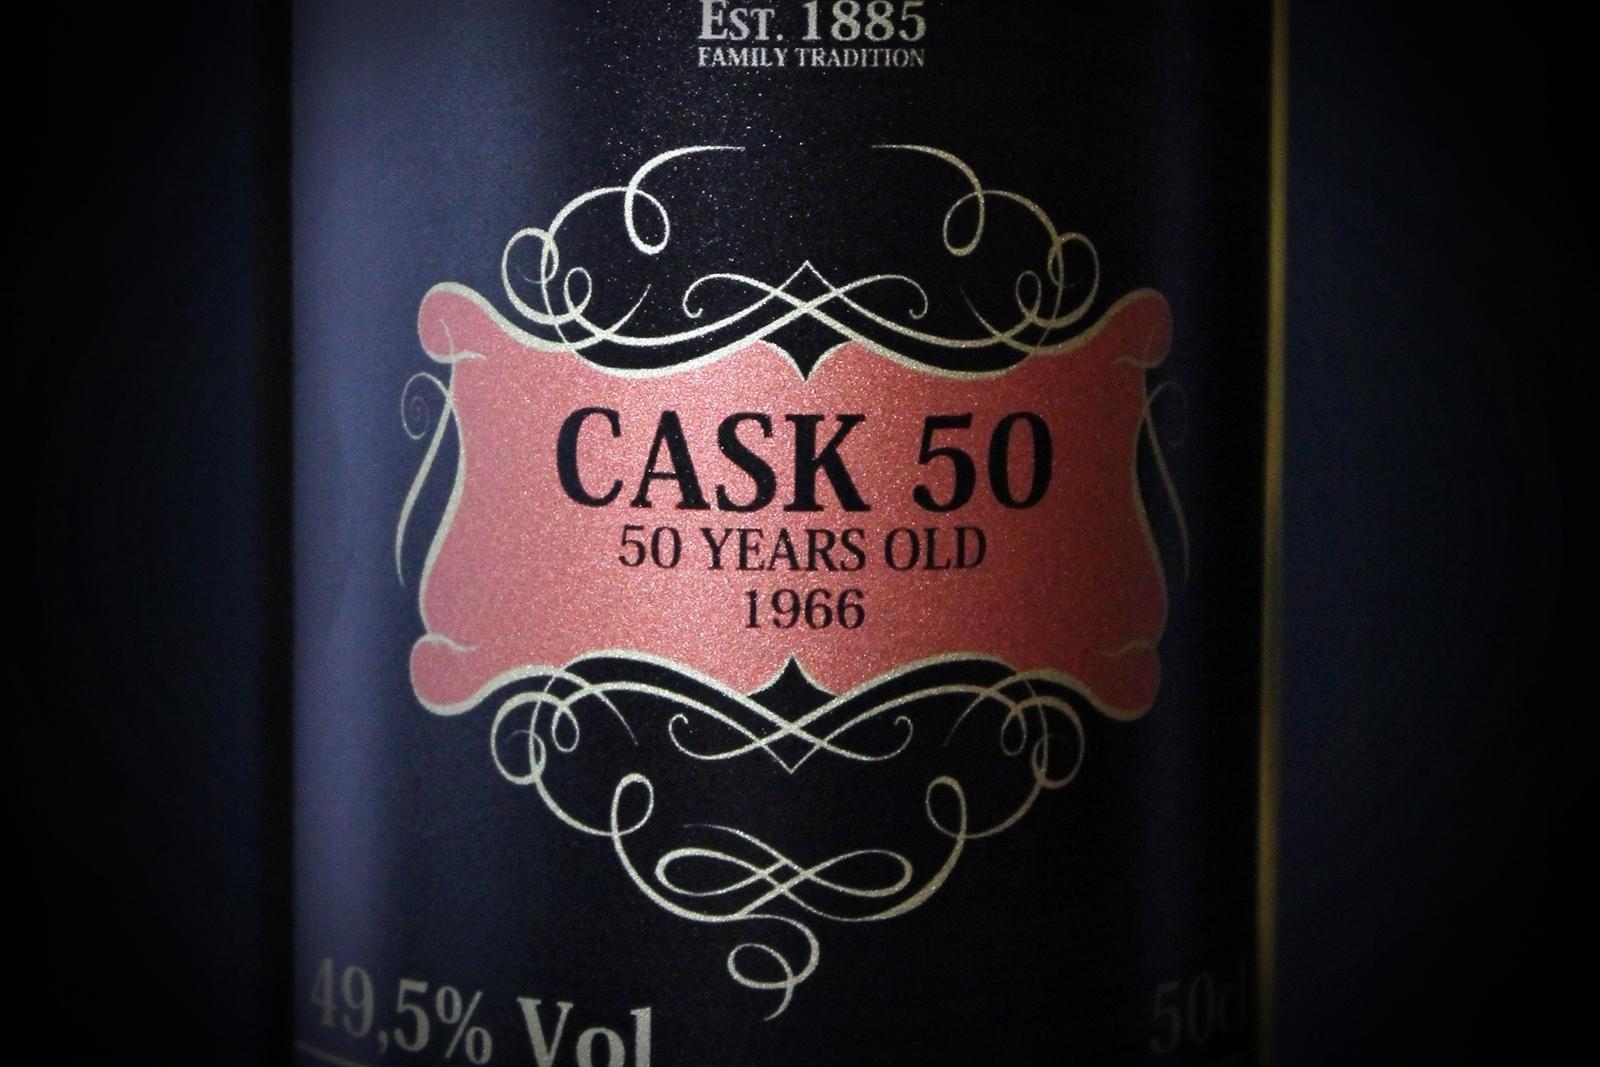 donatella whisky cask 50 label